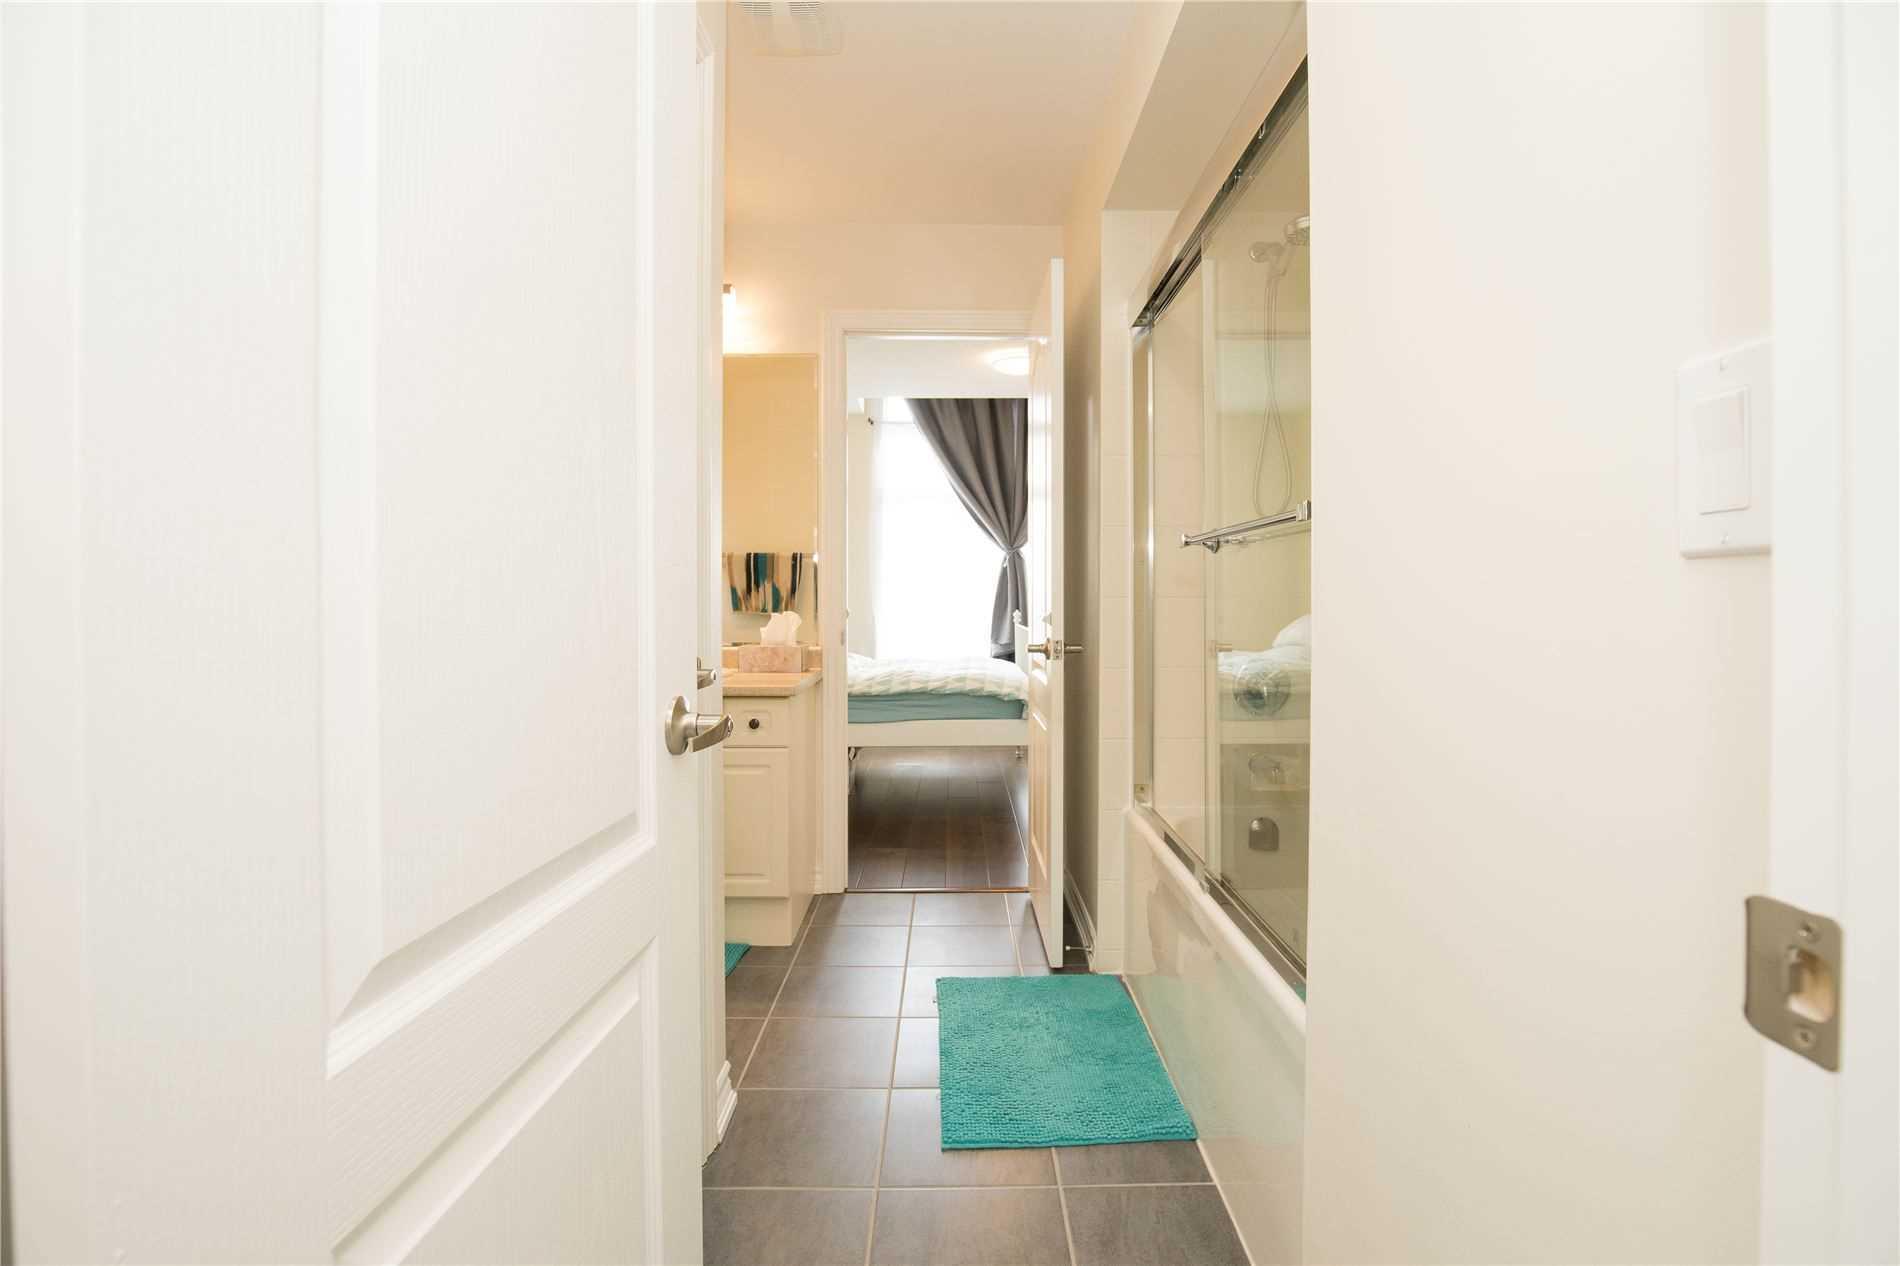 19 Elmcrest Dr, Brampton, Ontario L6Y5T7, 5 Bedrooms Bedrooms, 9 Rooms Rooms,4 BathroomsBathrooms,Detached,For Sale,Elmcrest,W5354786